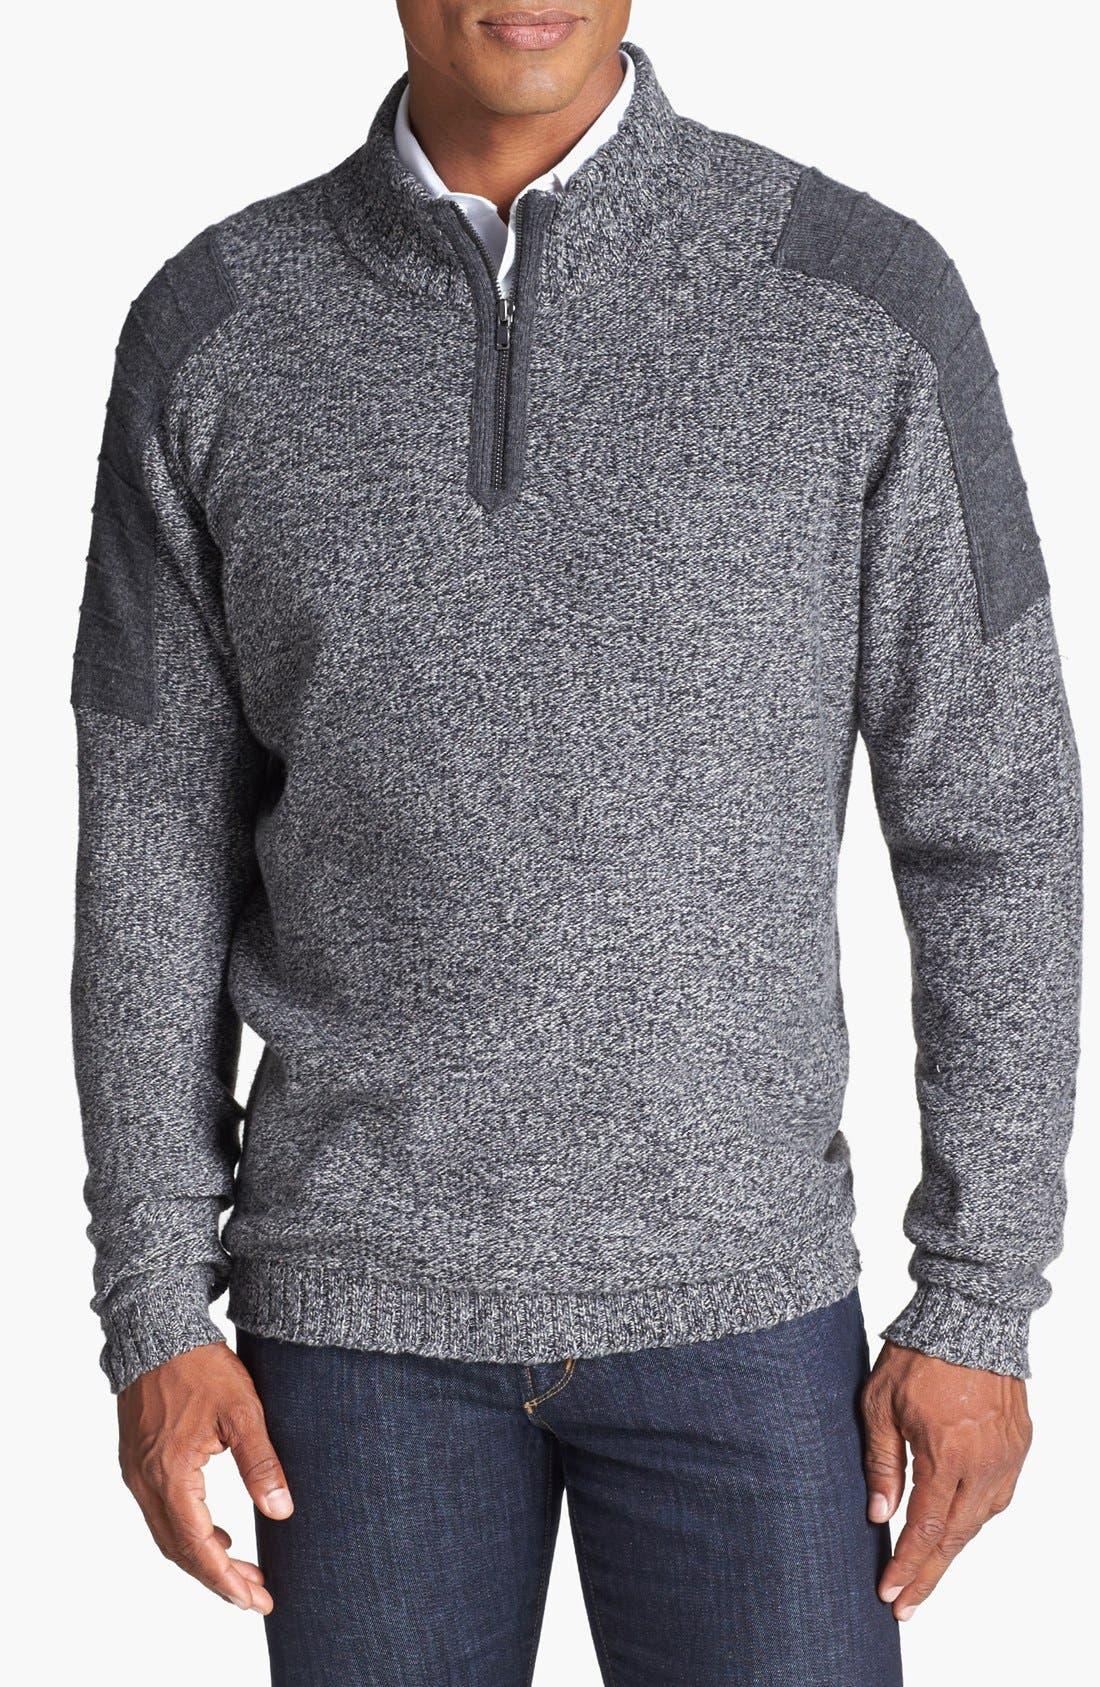 Alternate Image 1 Selected - Cutter & Buck 'Cabot' Half Zip Sweater